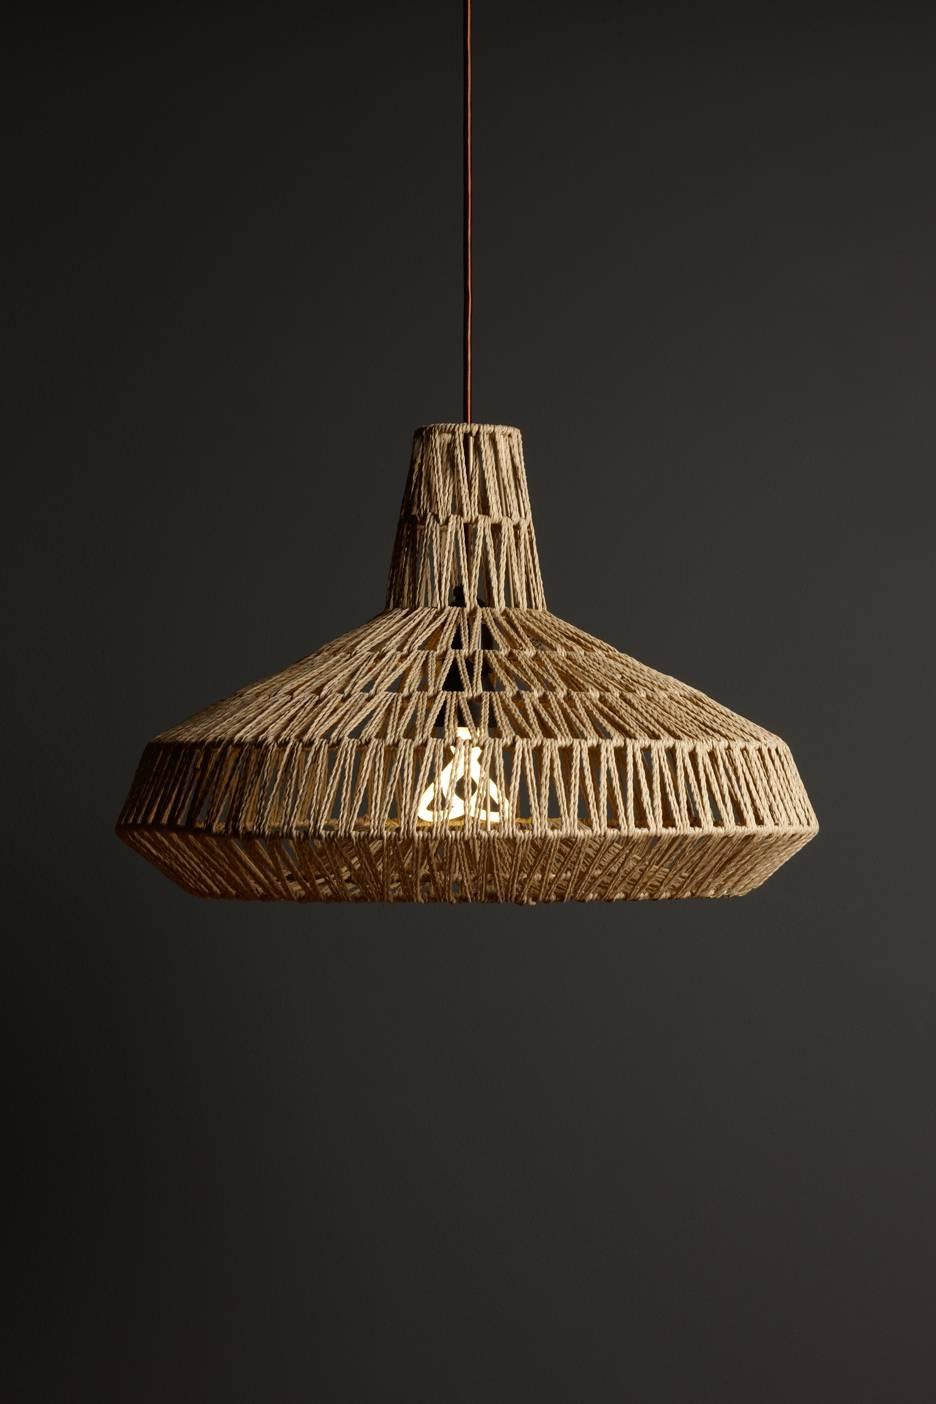 New Wicker Pendant Light 95 For Your Tin Pendant Lights With within Tin Pendant Lights (Image 11 of 15)